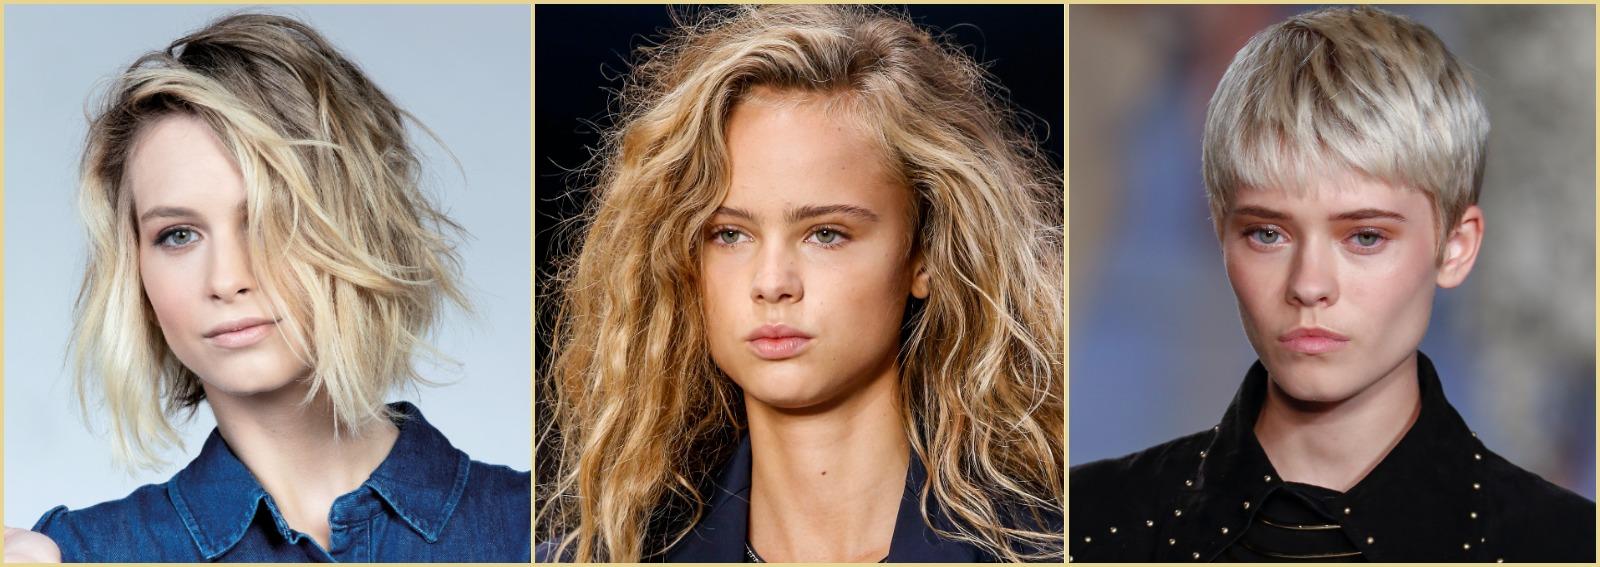 capelli biondi 2020 di tendenza cover desktop